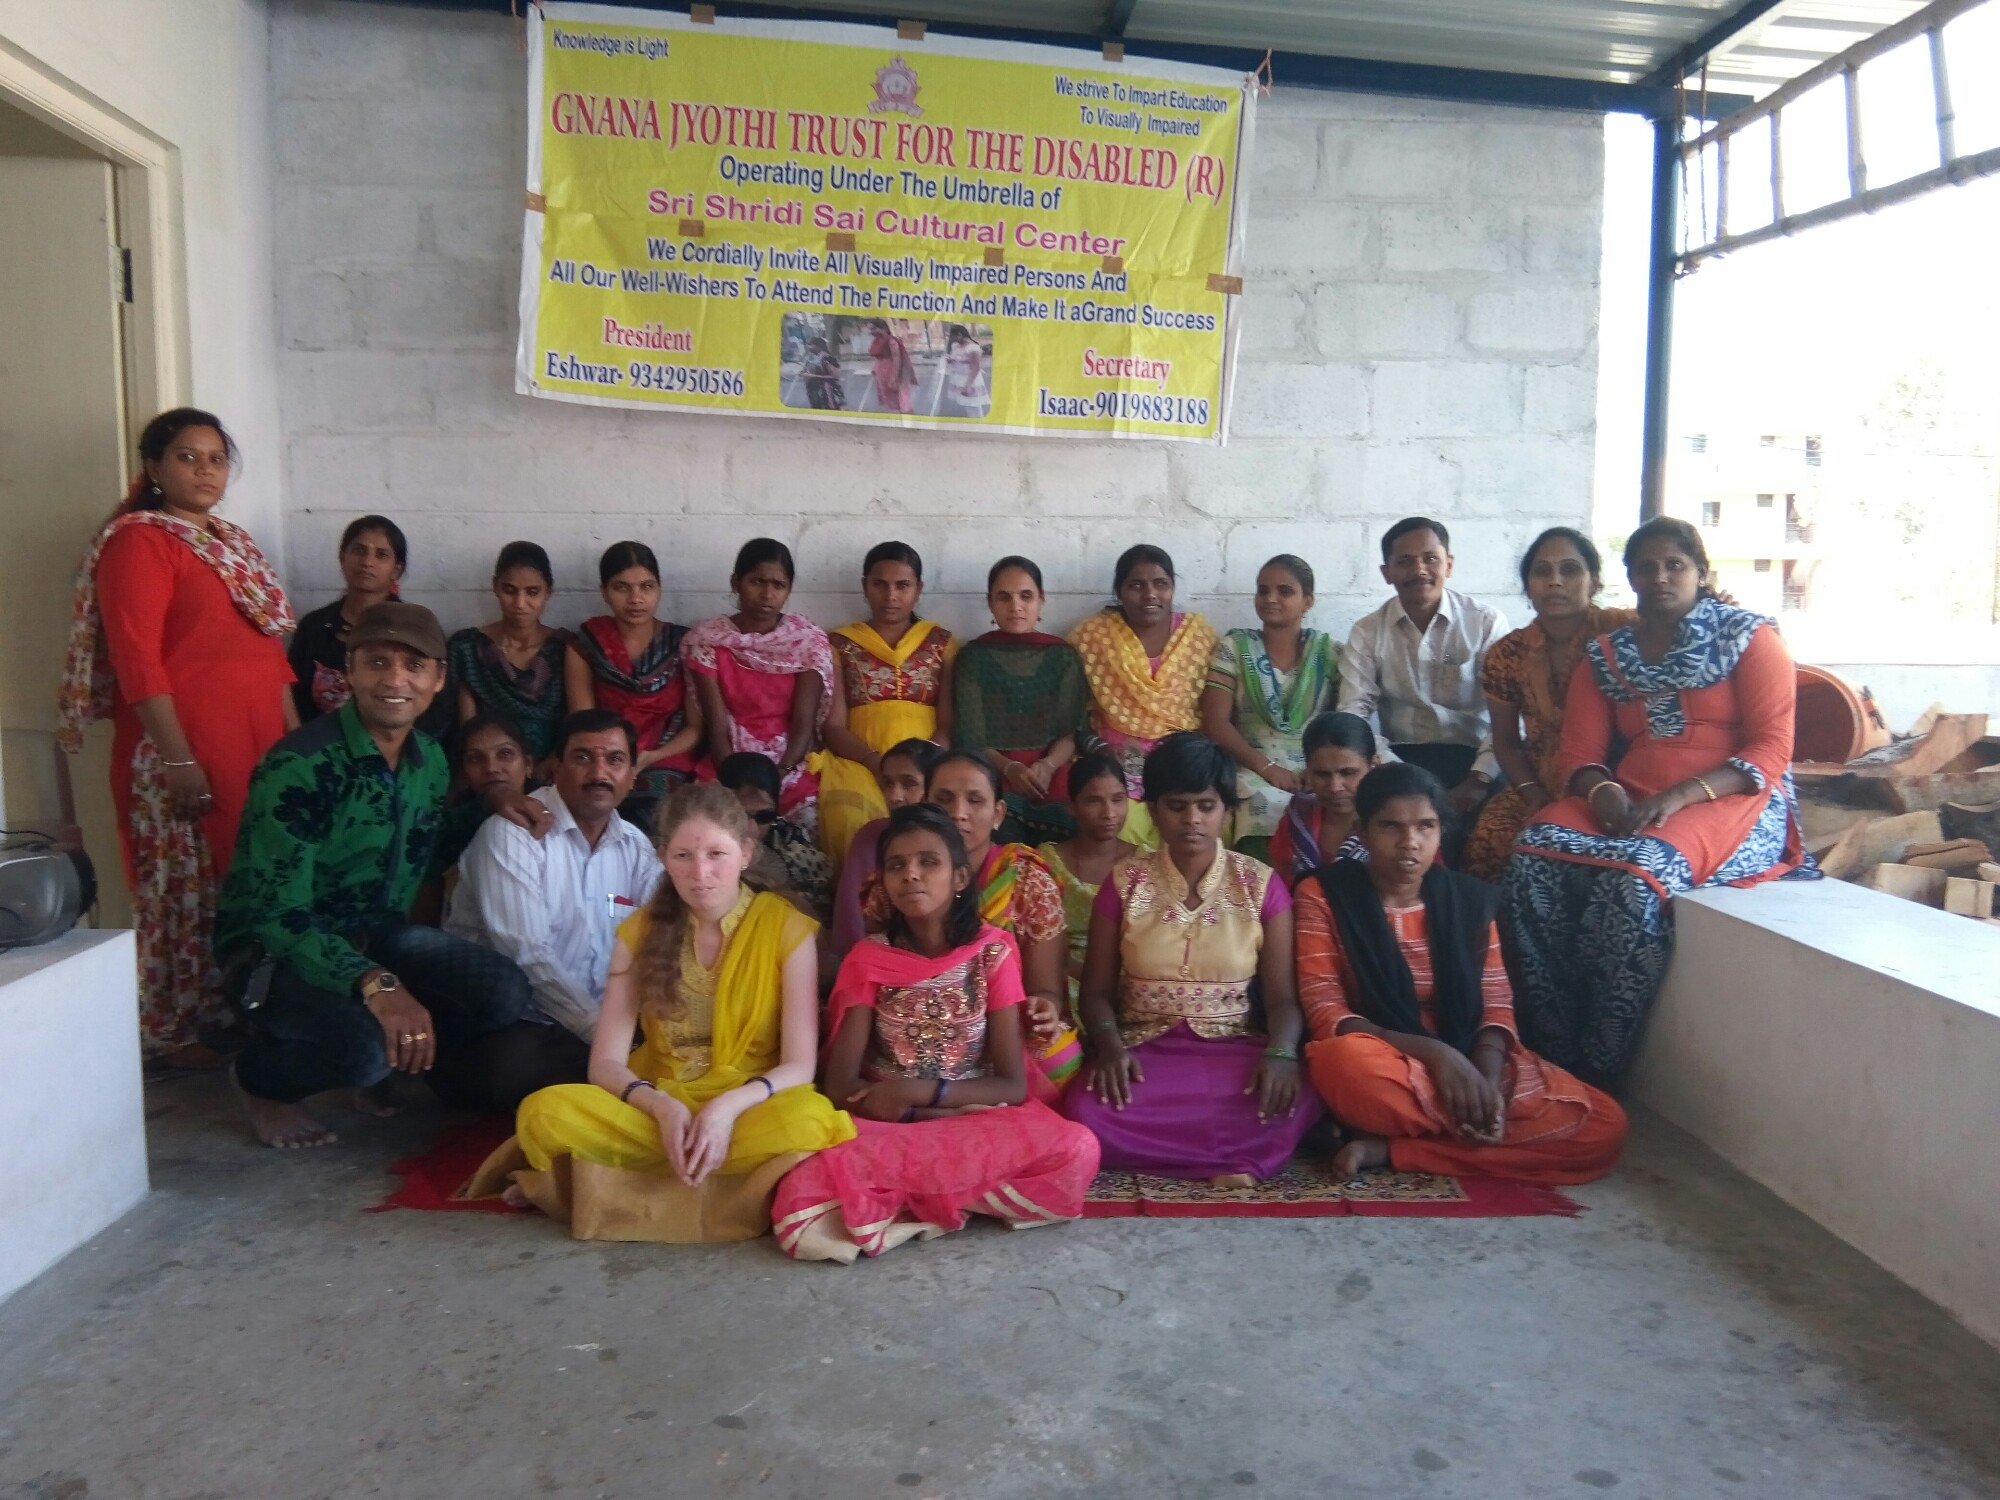 Gnana Jyothi Trust for the Disabled in Vijayanagar